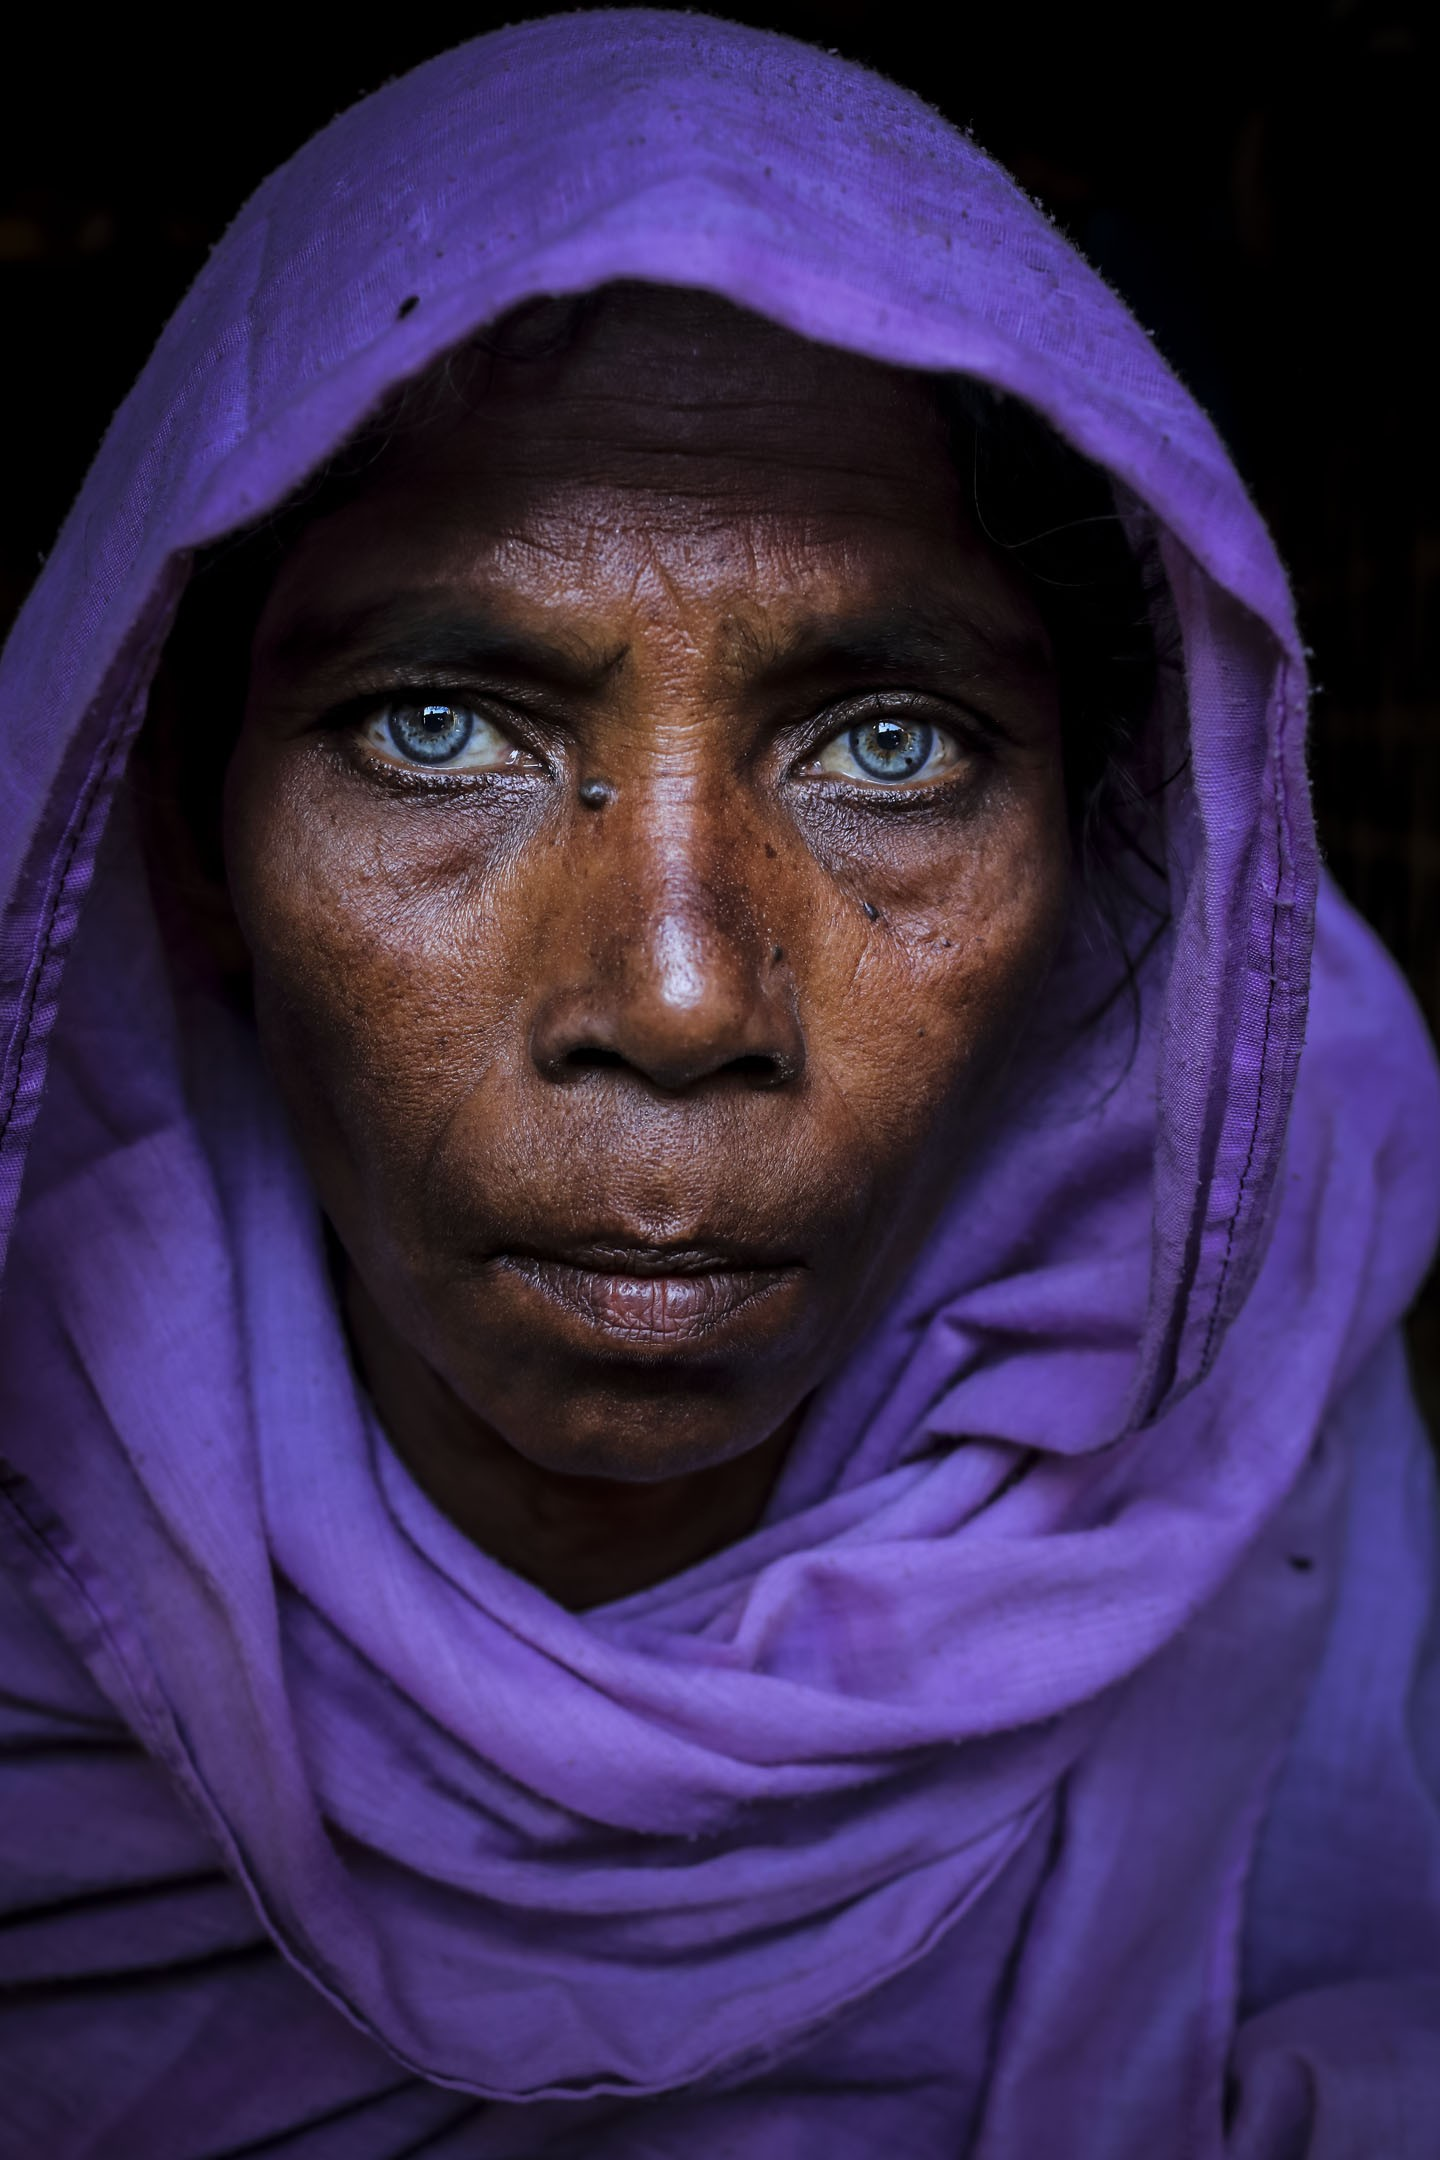 Plight of Rohingya Refugee